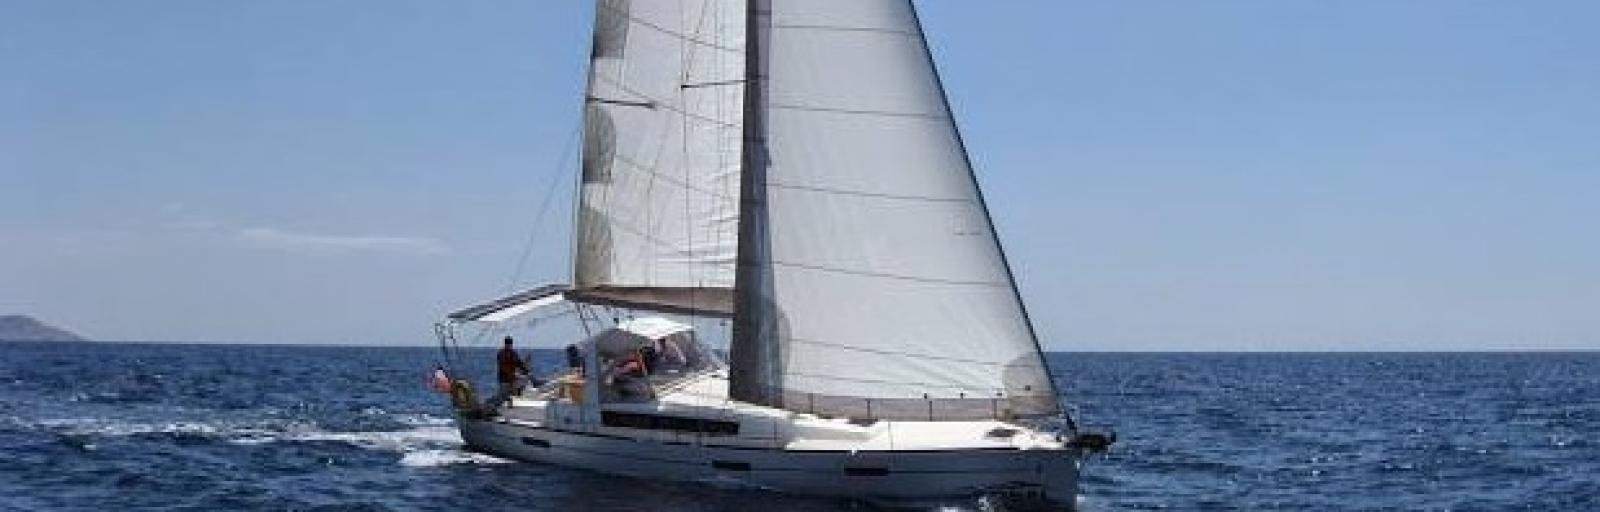 OCEANIS 45 sous voiles